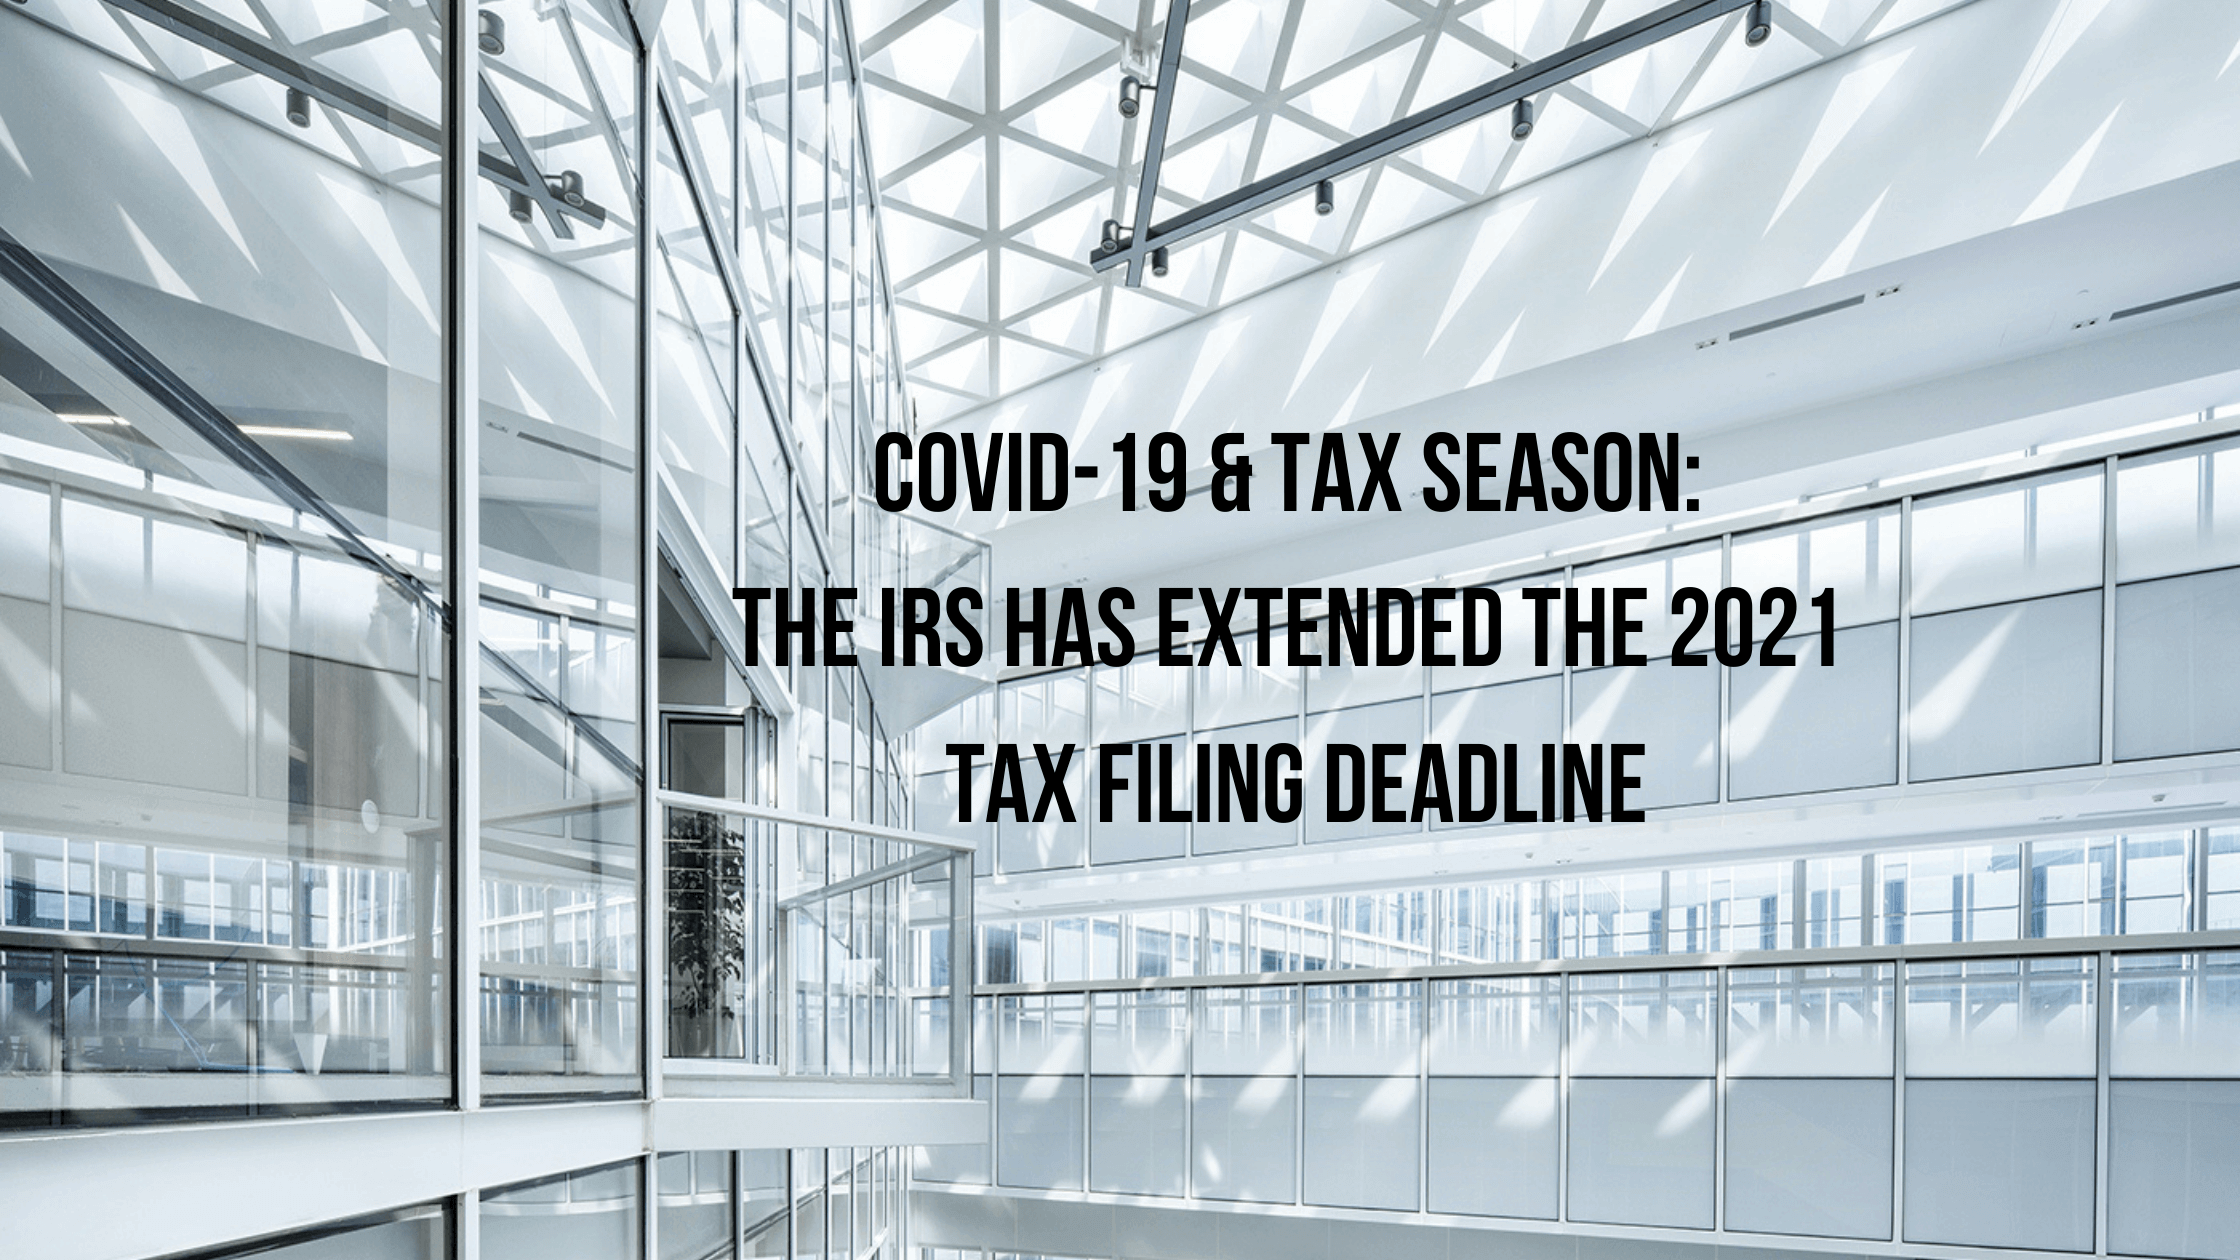 COVID-19 & Tax Season: The IRS Has Extended The 2021 Tax Filing Deadline Thumbnail